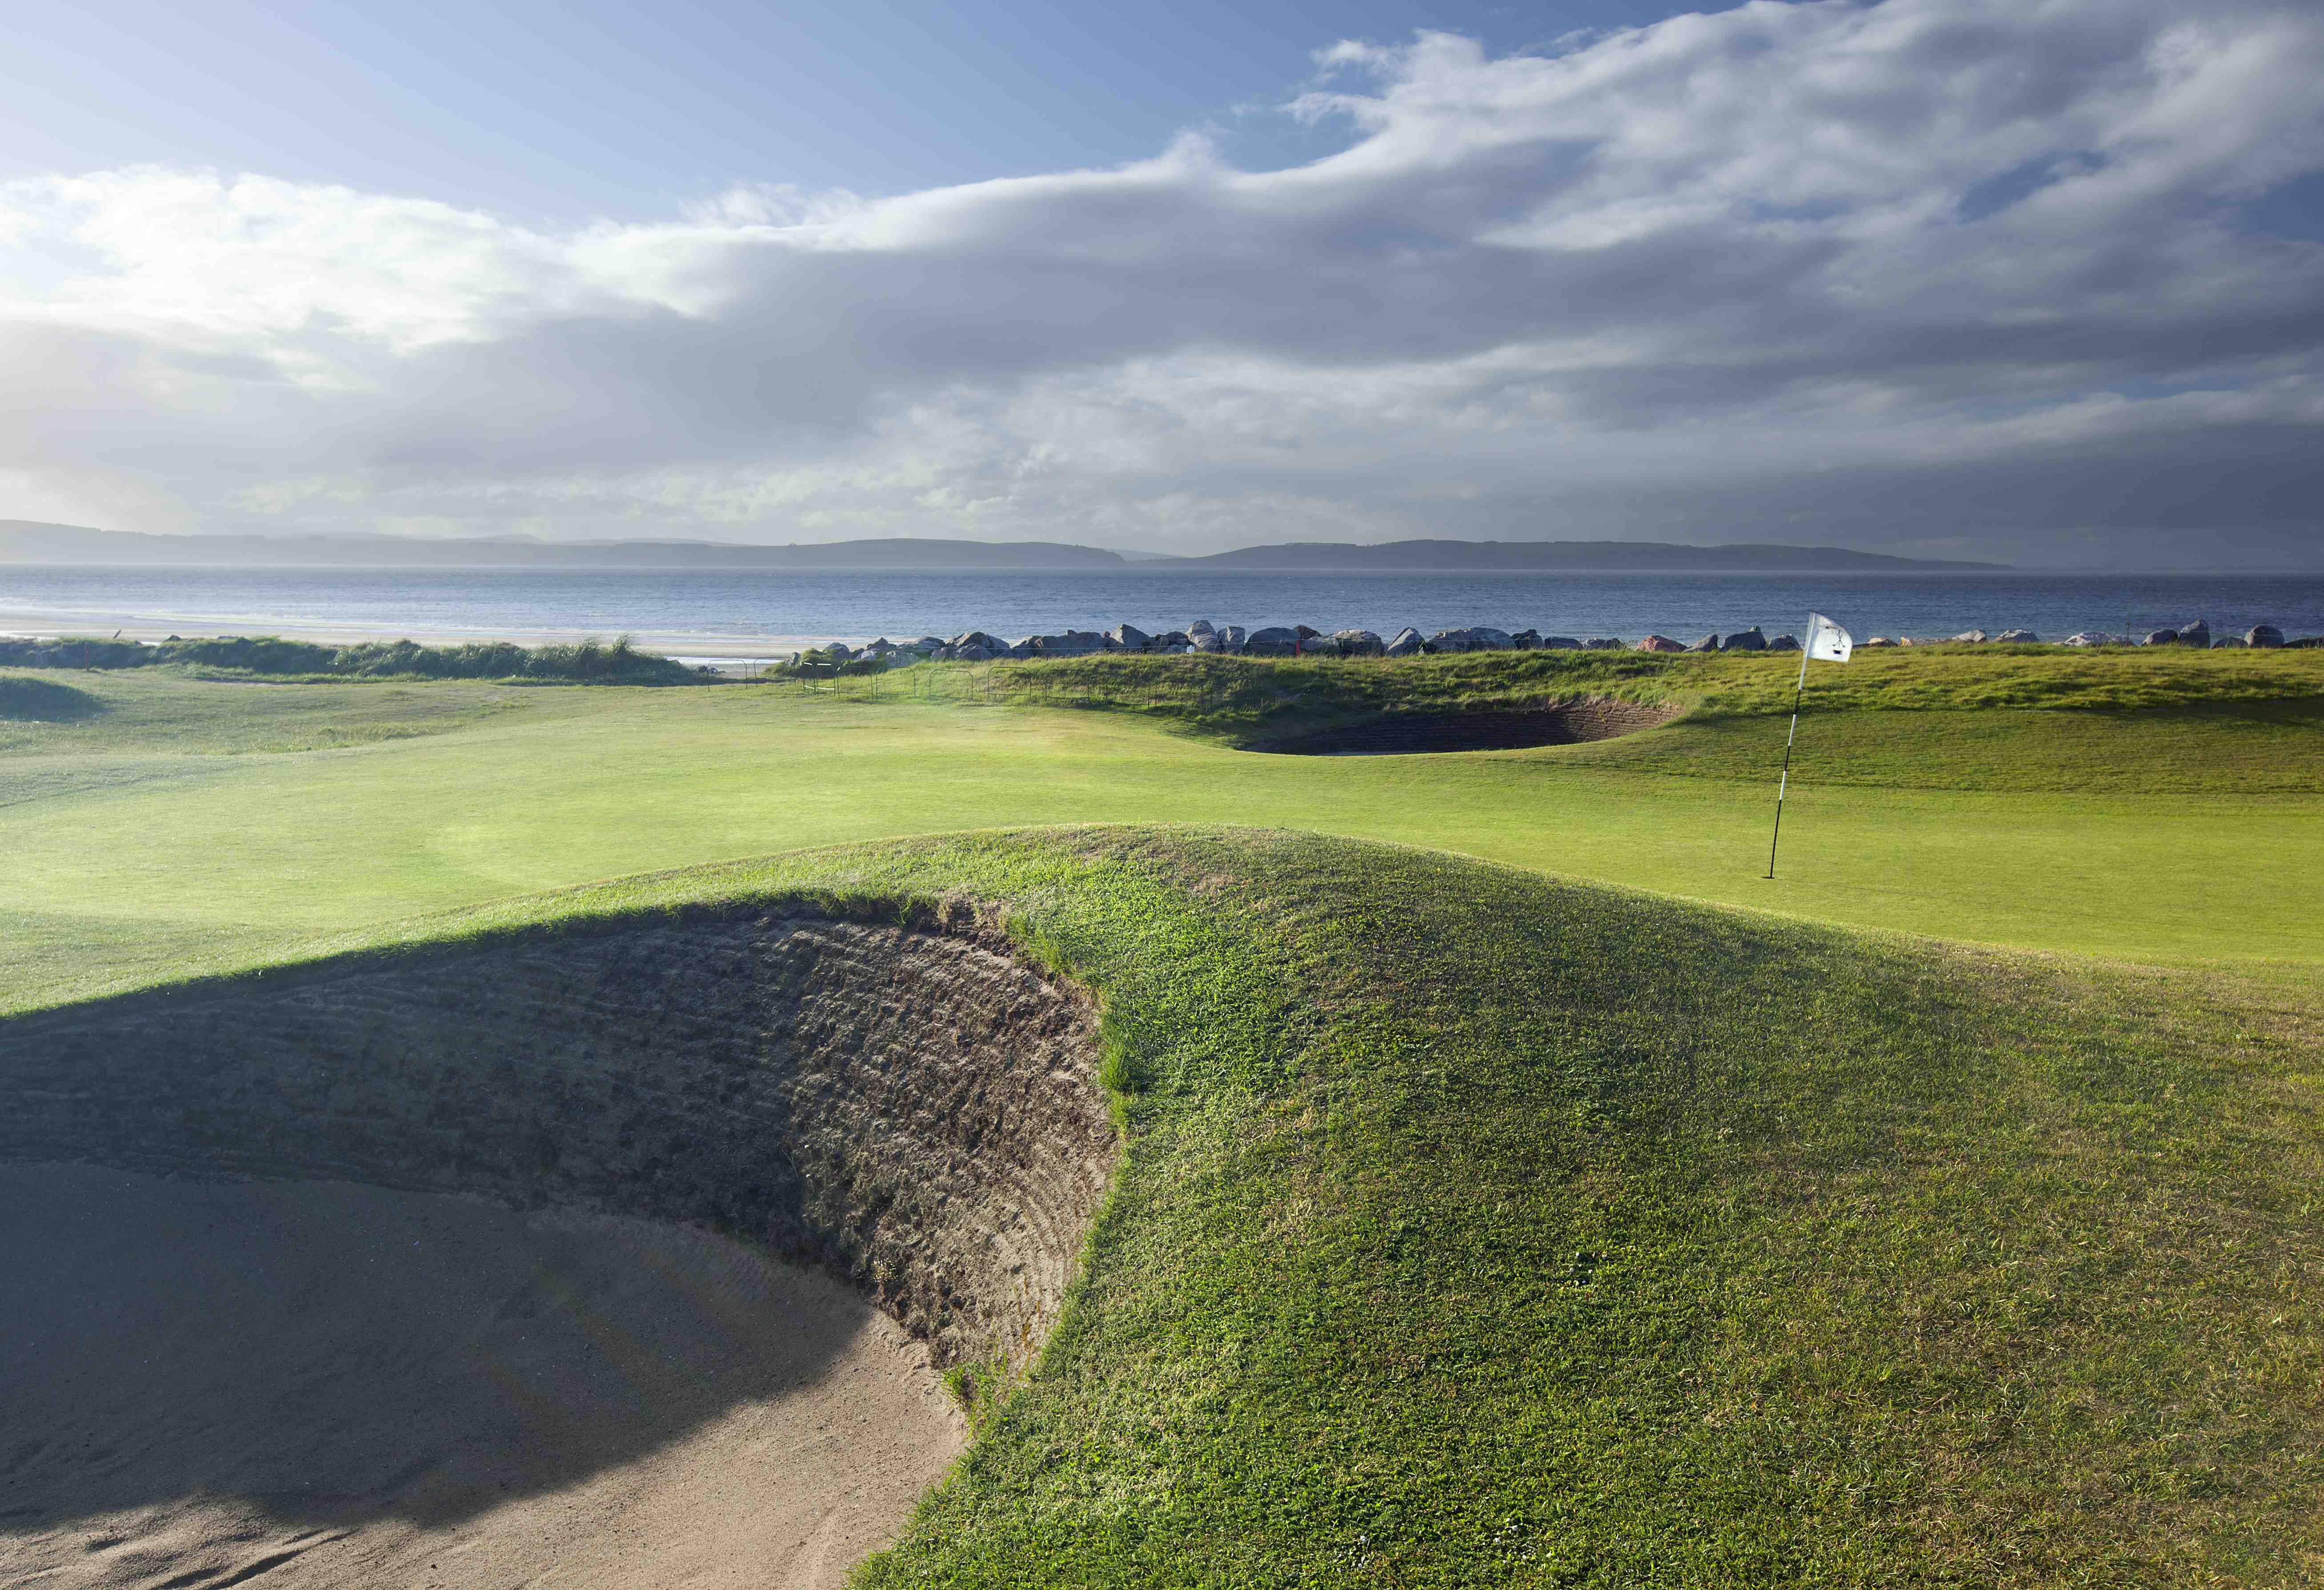 The Nairn Golf Club – Global Golf Links